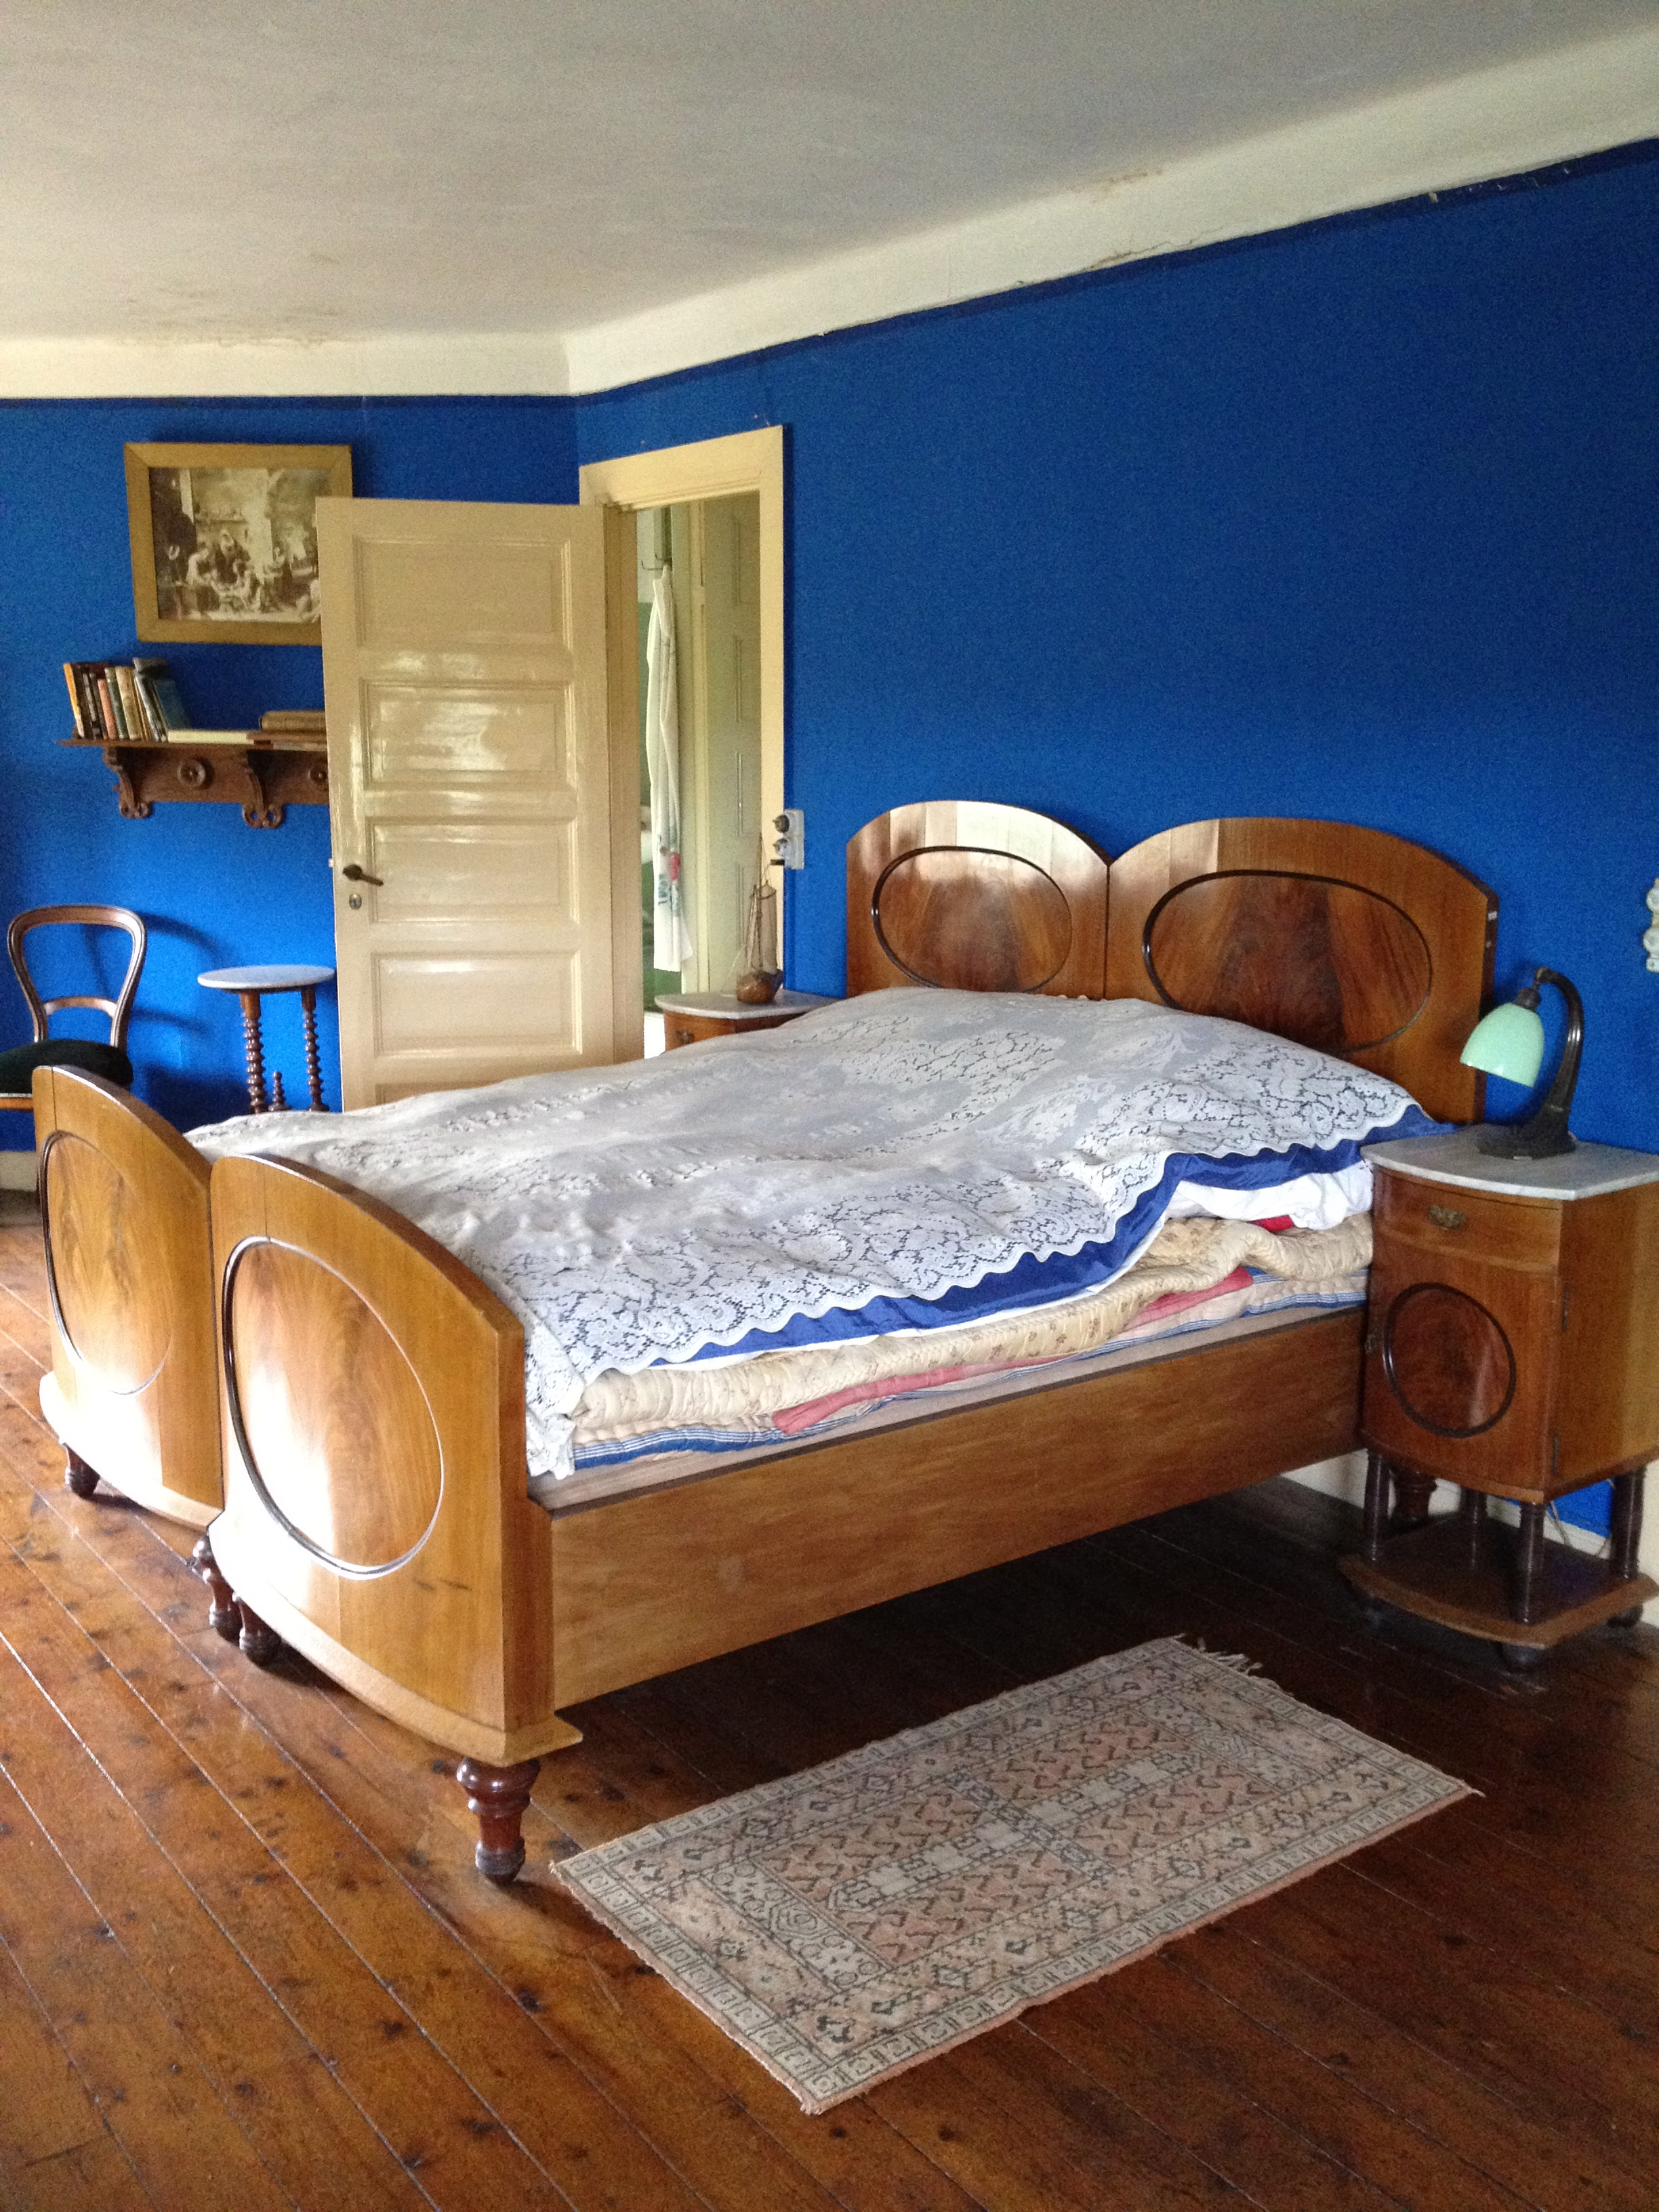 Image Result For Bedroom Furniture Picture